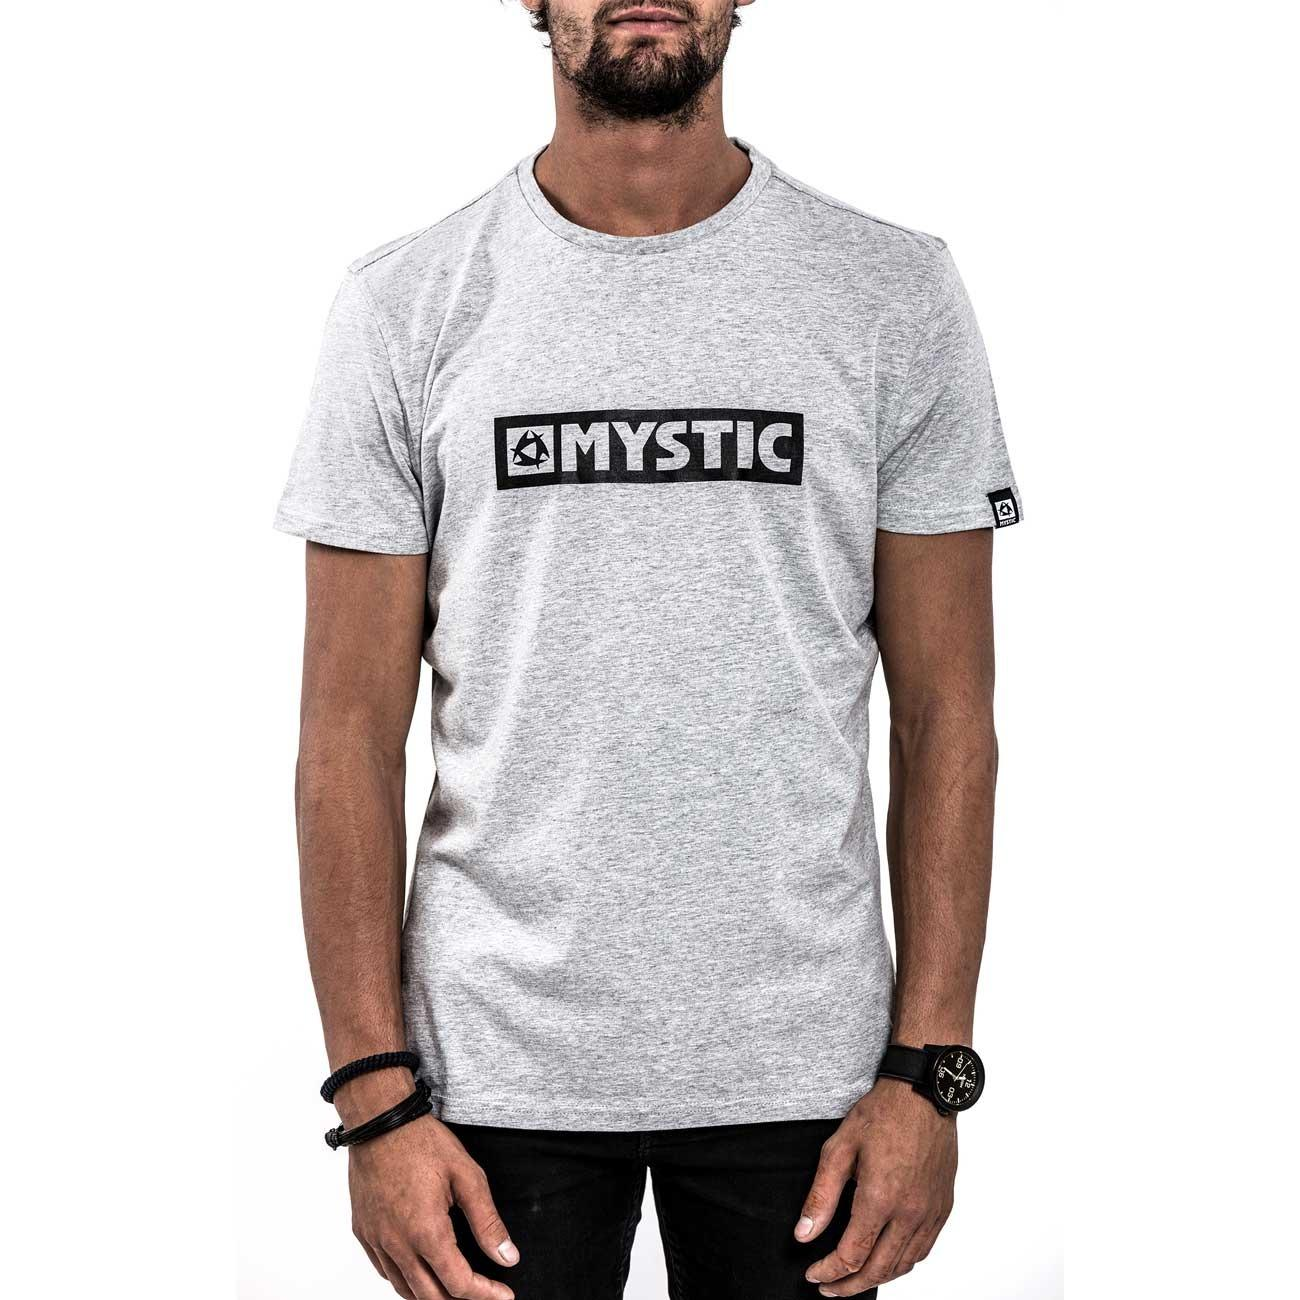 Brand 2.0 Tee クルーネック ロゴTシャツ